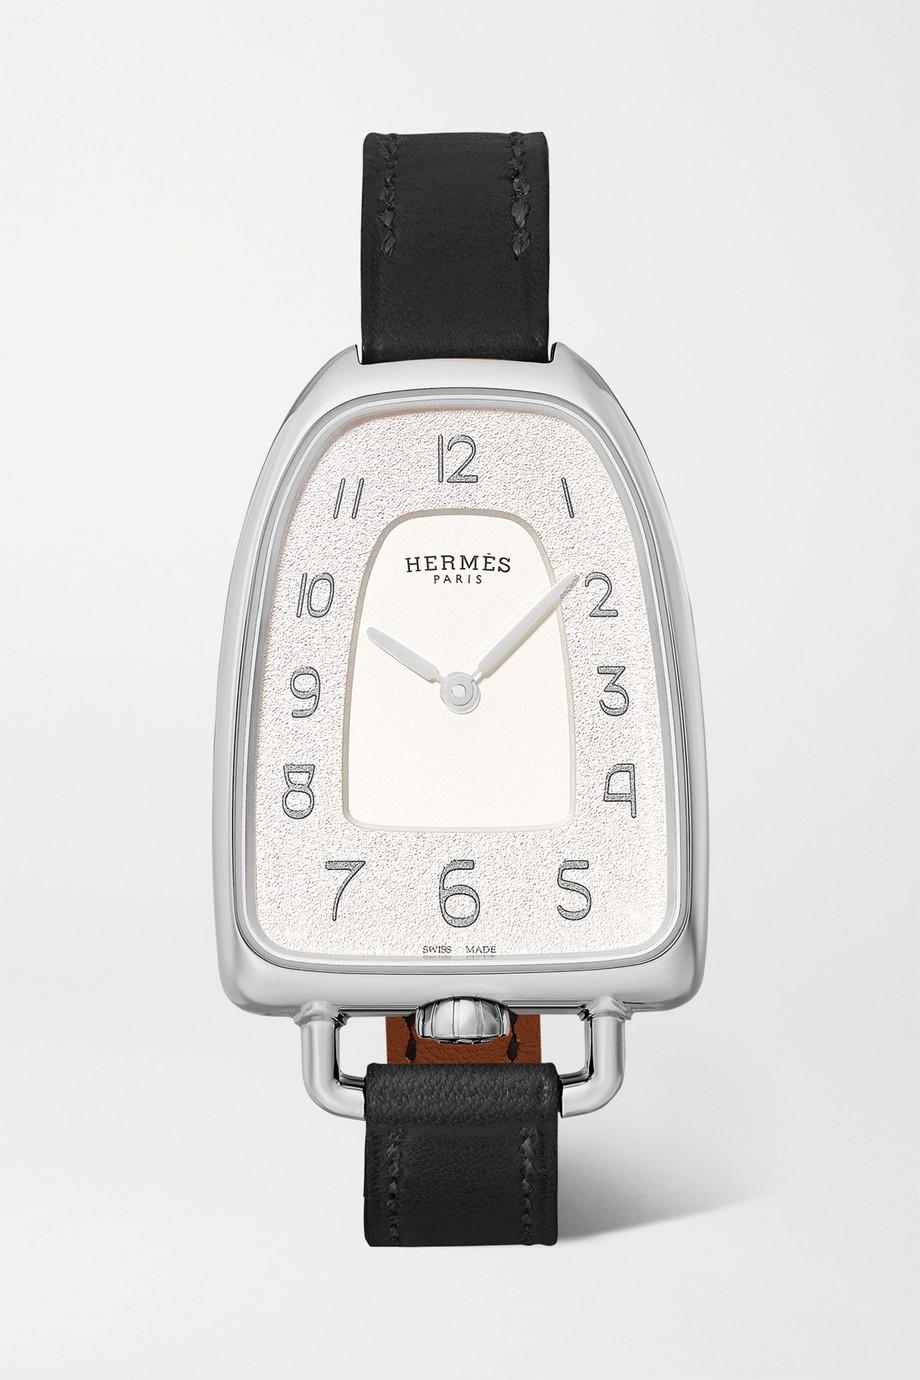 Hermès Timepieces Galop d'Hermès 26 mm mittelgroße Uhr aus Edelstahl mit Lederarmband